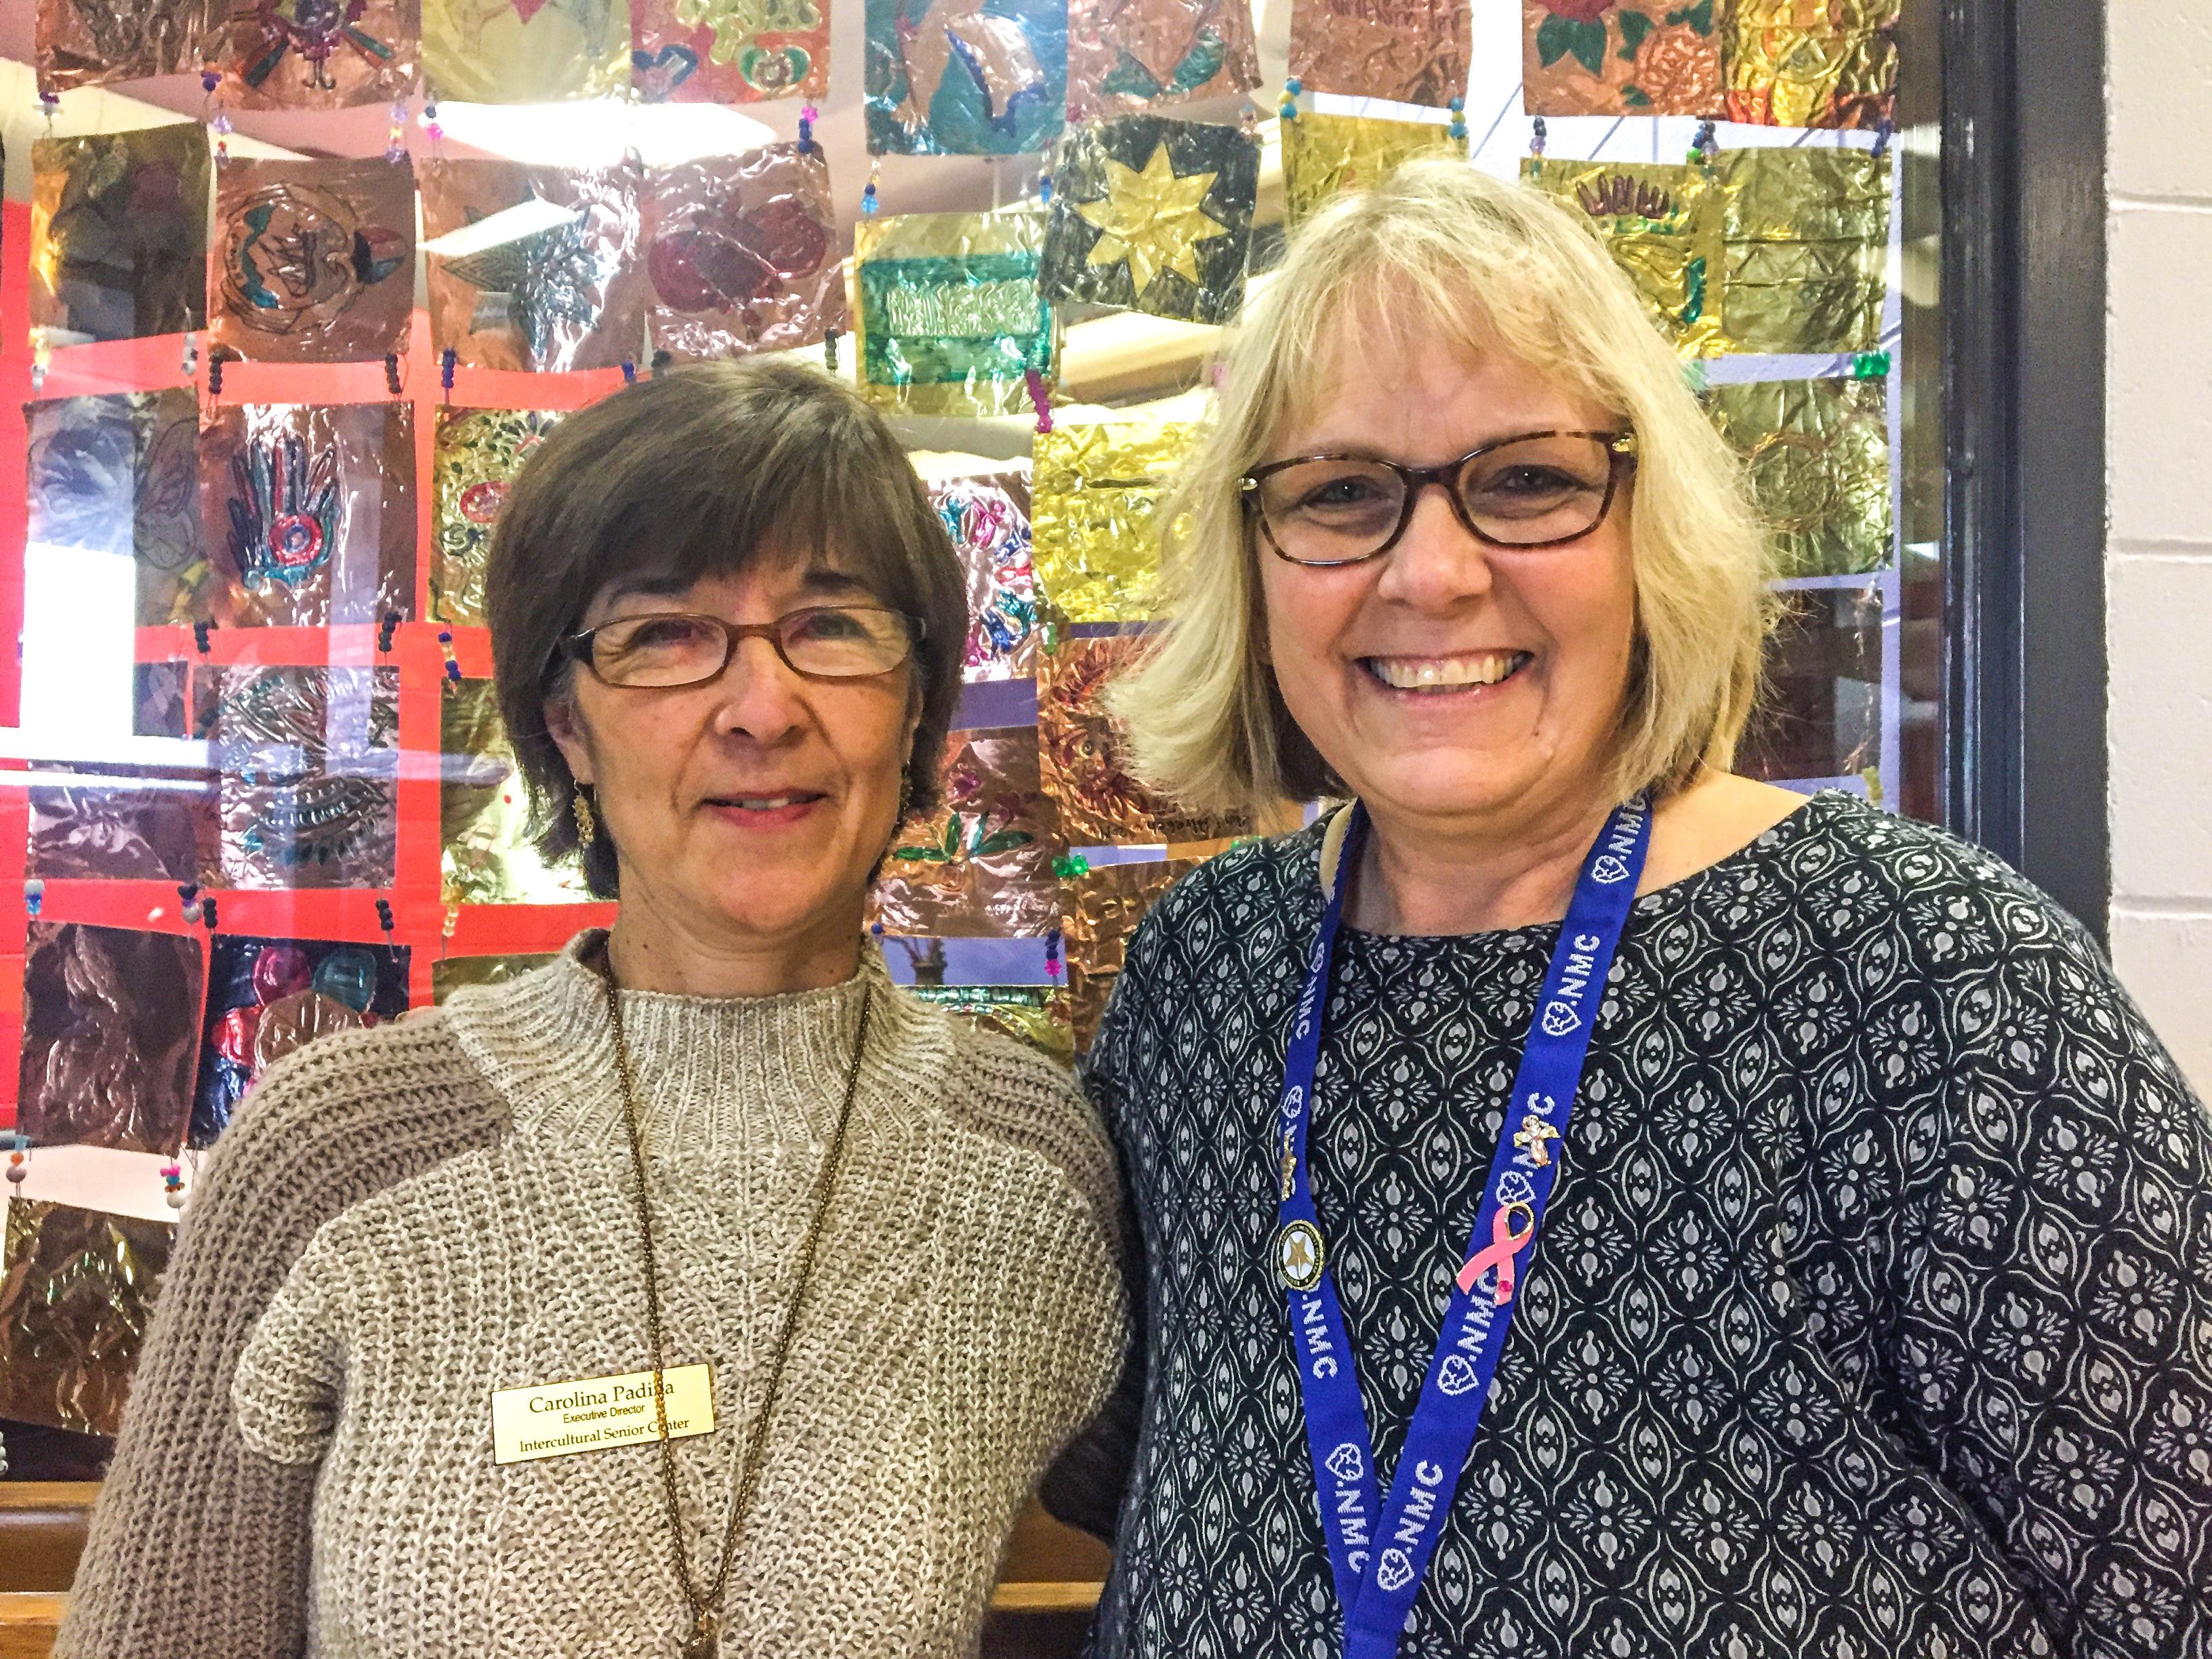 Carolina Padilla, founder and executive director of Omaha's Intercultural Senior Center, with NMC nursing faculty member Kim Hall.